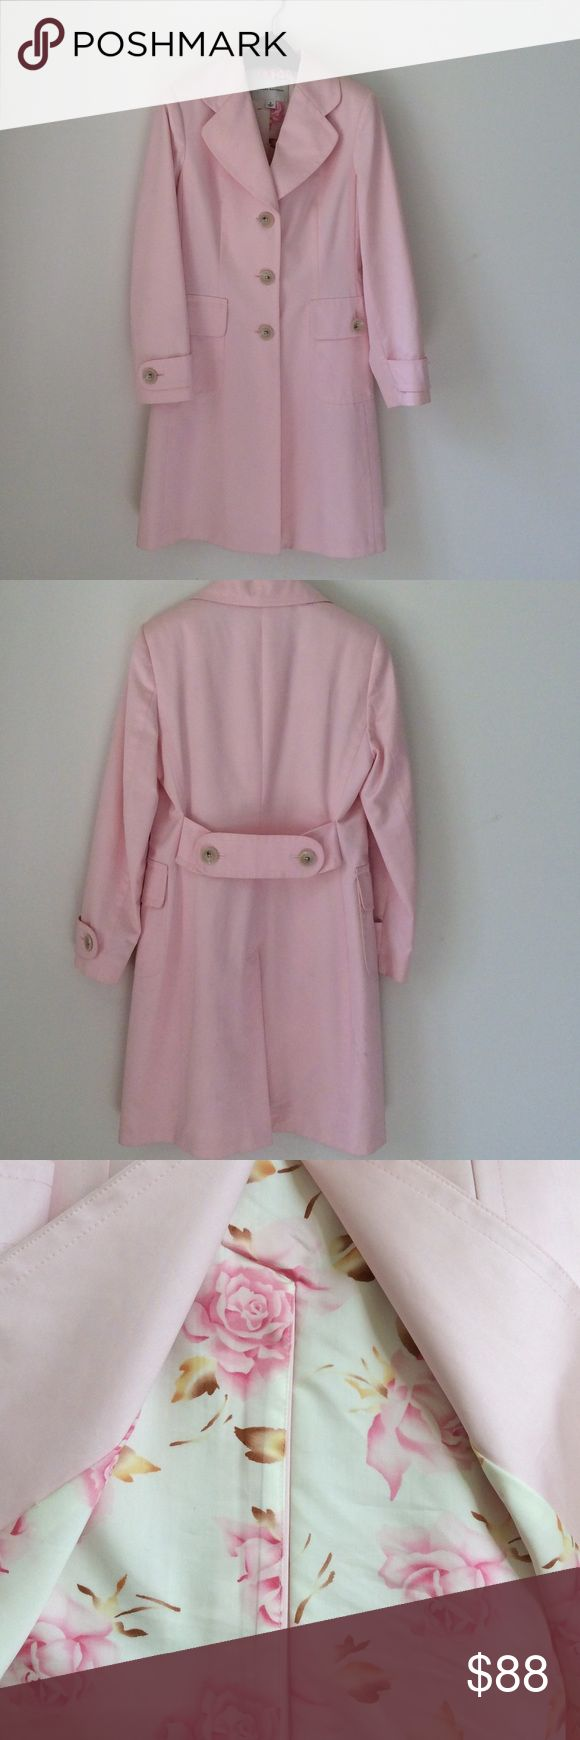 BANANA REPUBLIC COAT🌸 Stunning pale pink cotton sateen coat with floral satin lining Banana Republic Jackets & Coats